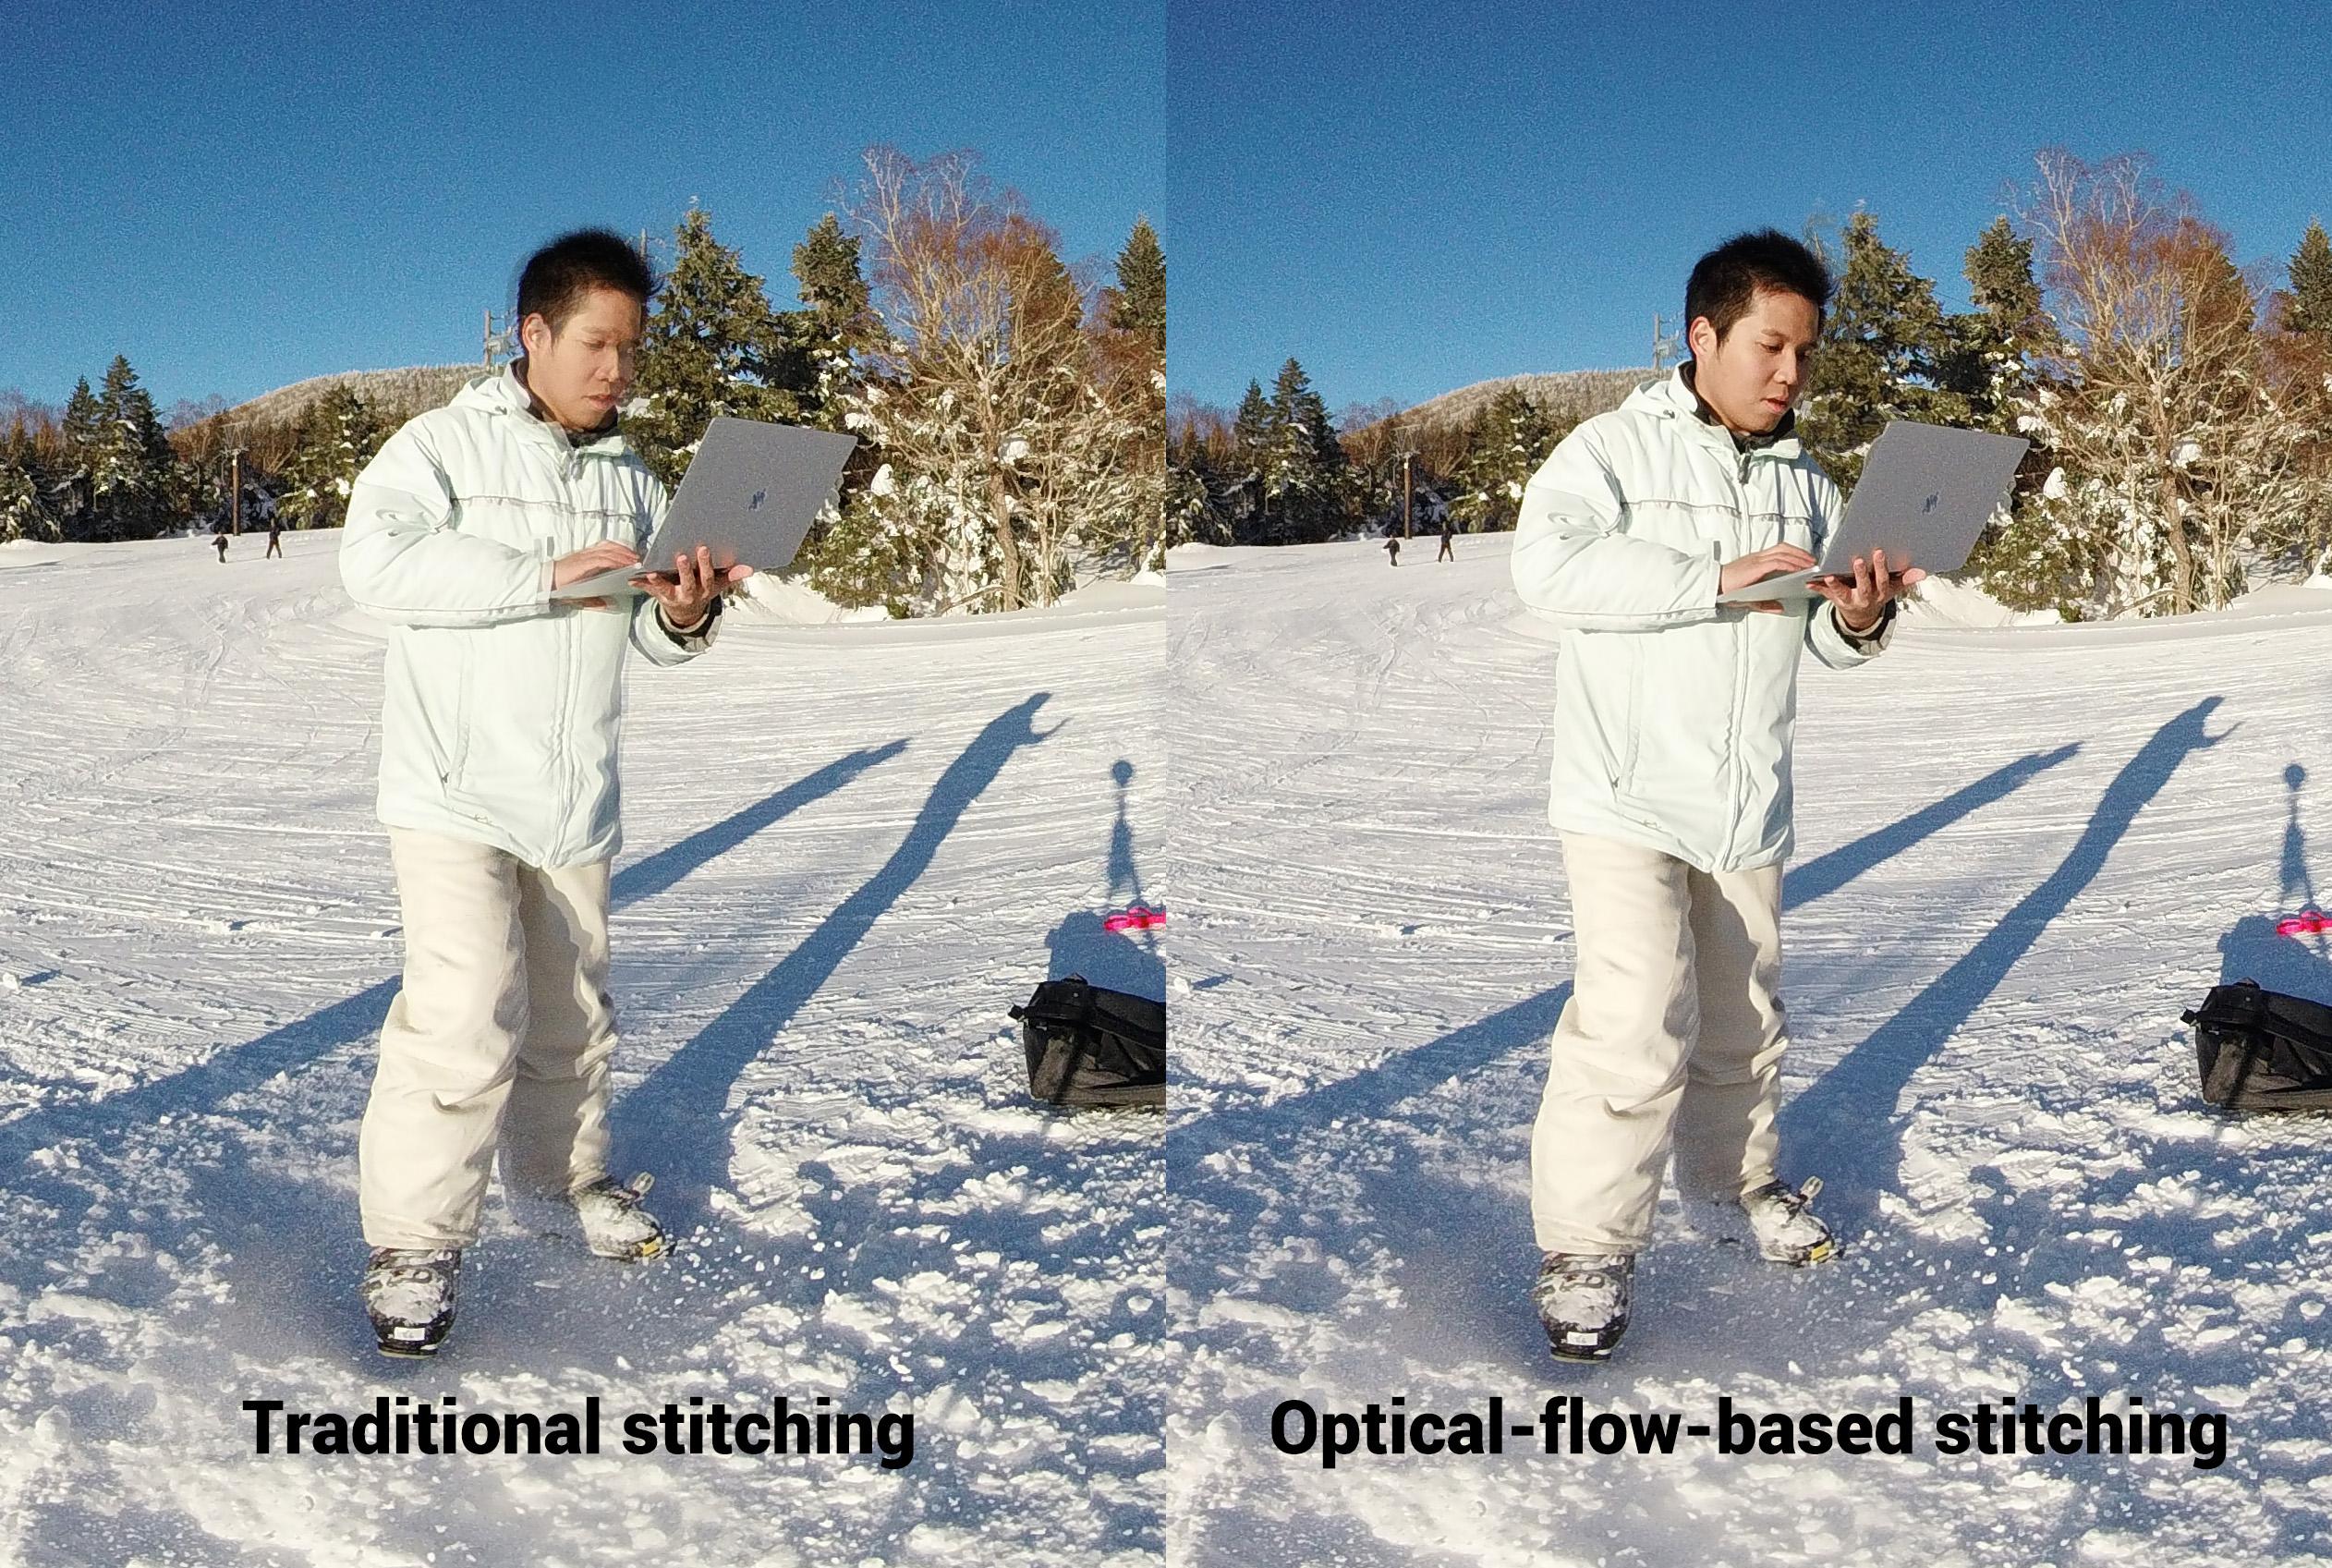 Optical Flow Explained: The Key to Seamless Image Stitching